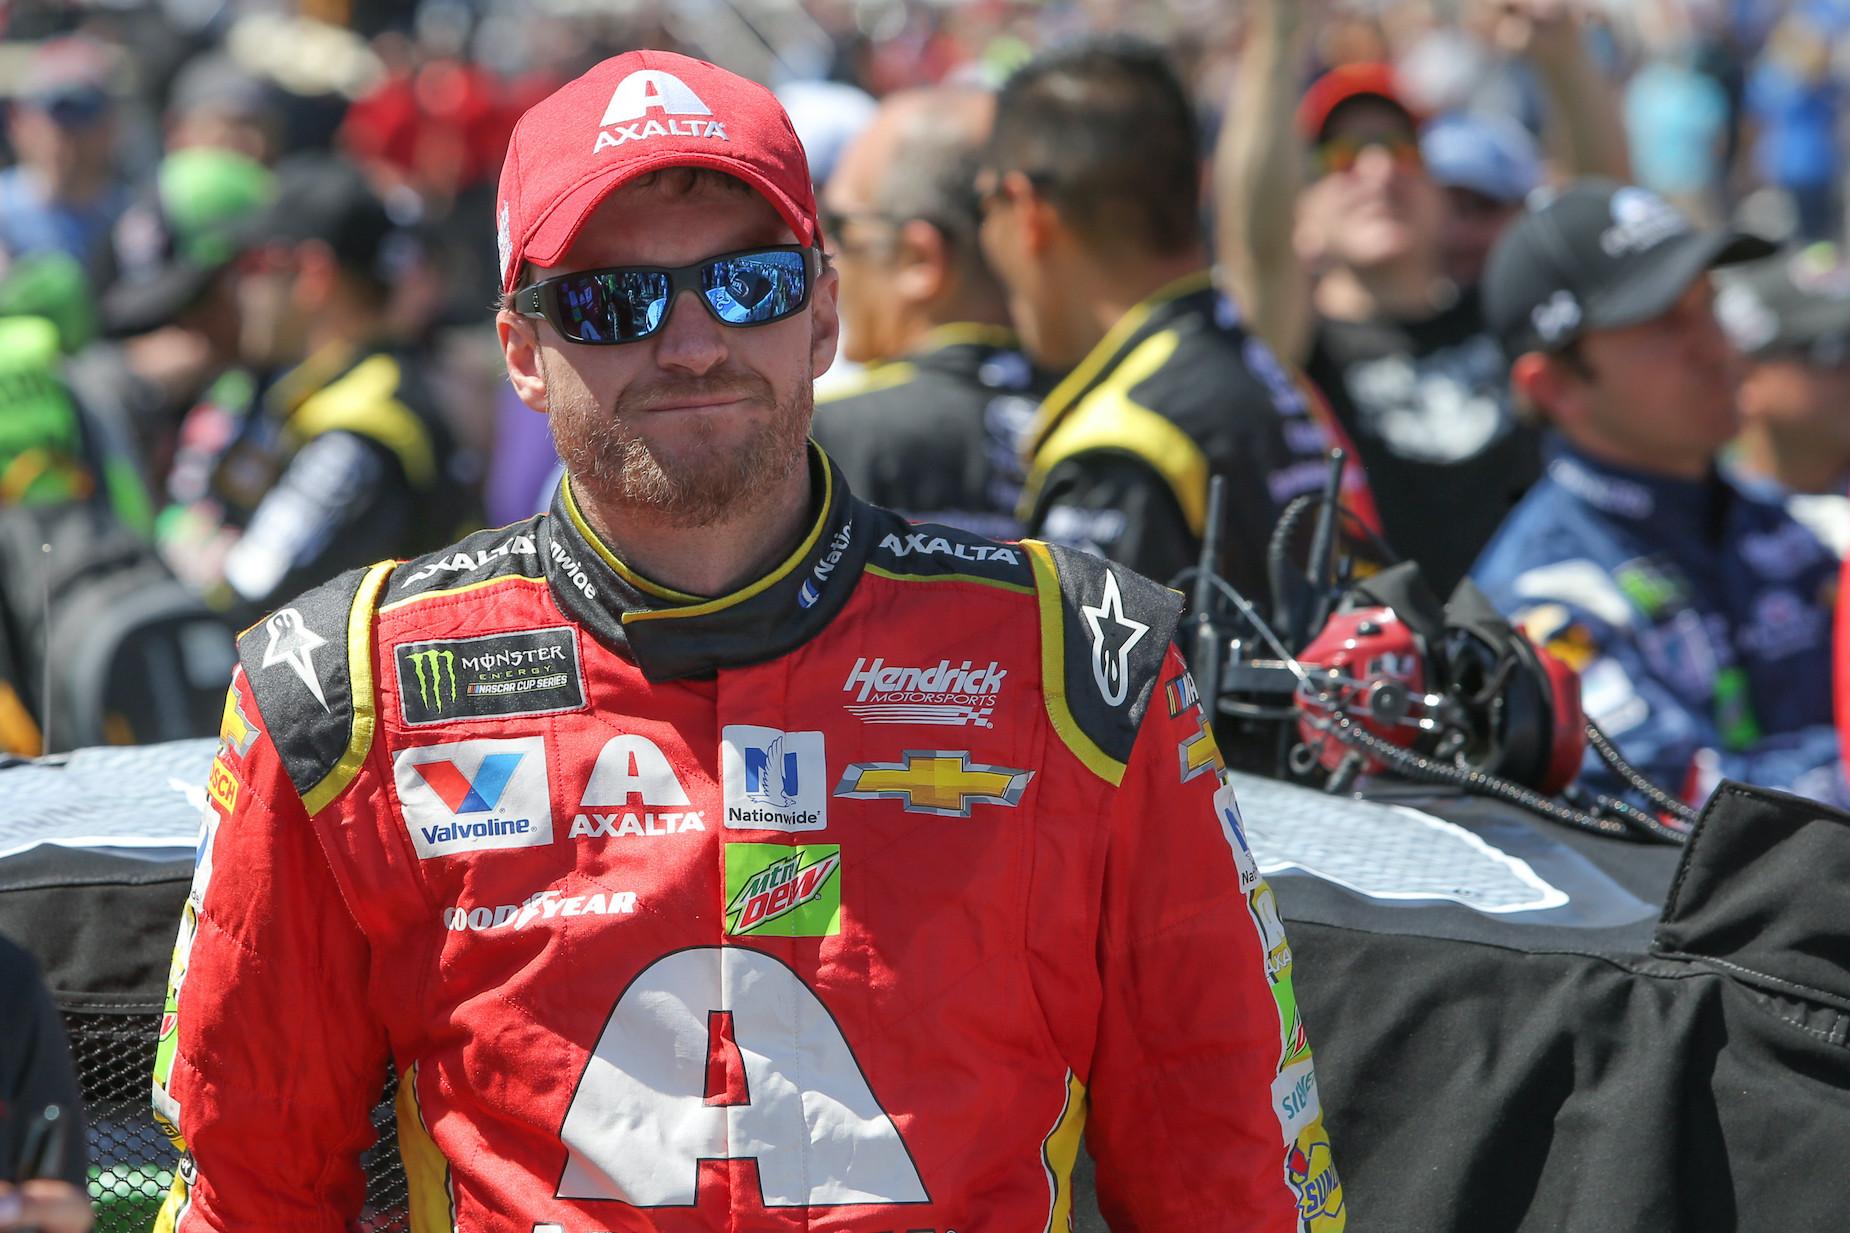 Dale Earnhardt Jr. has built up plenty of fame and fortune in NASCAR.